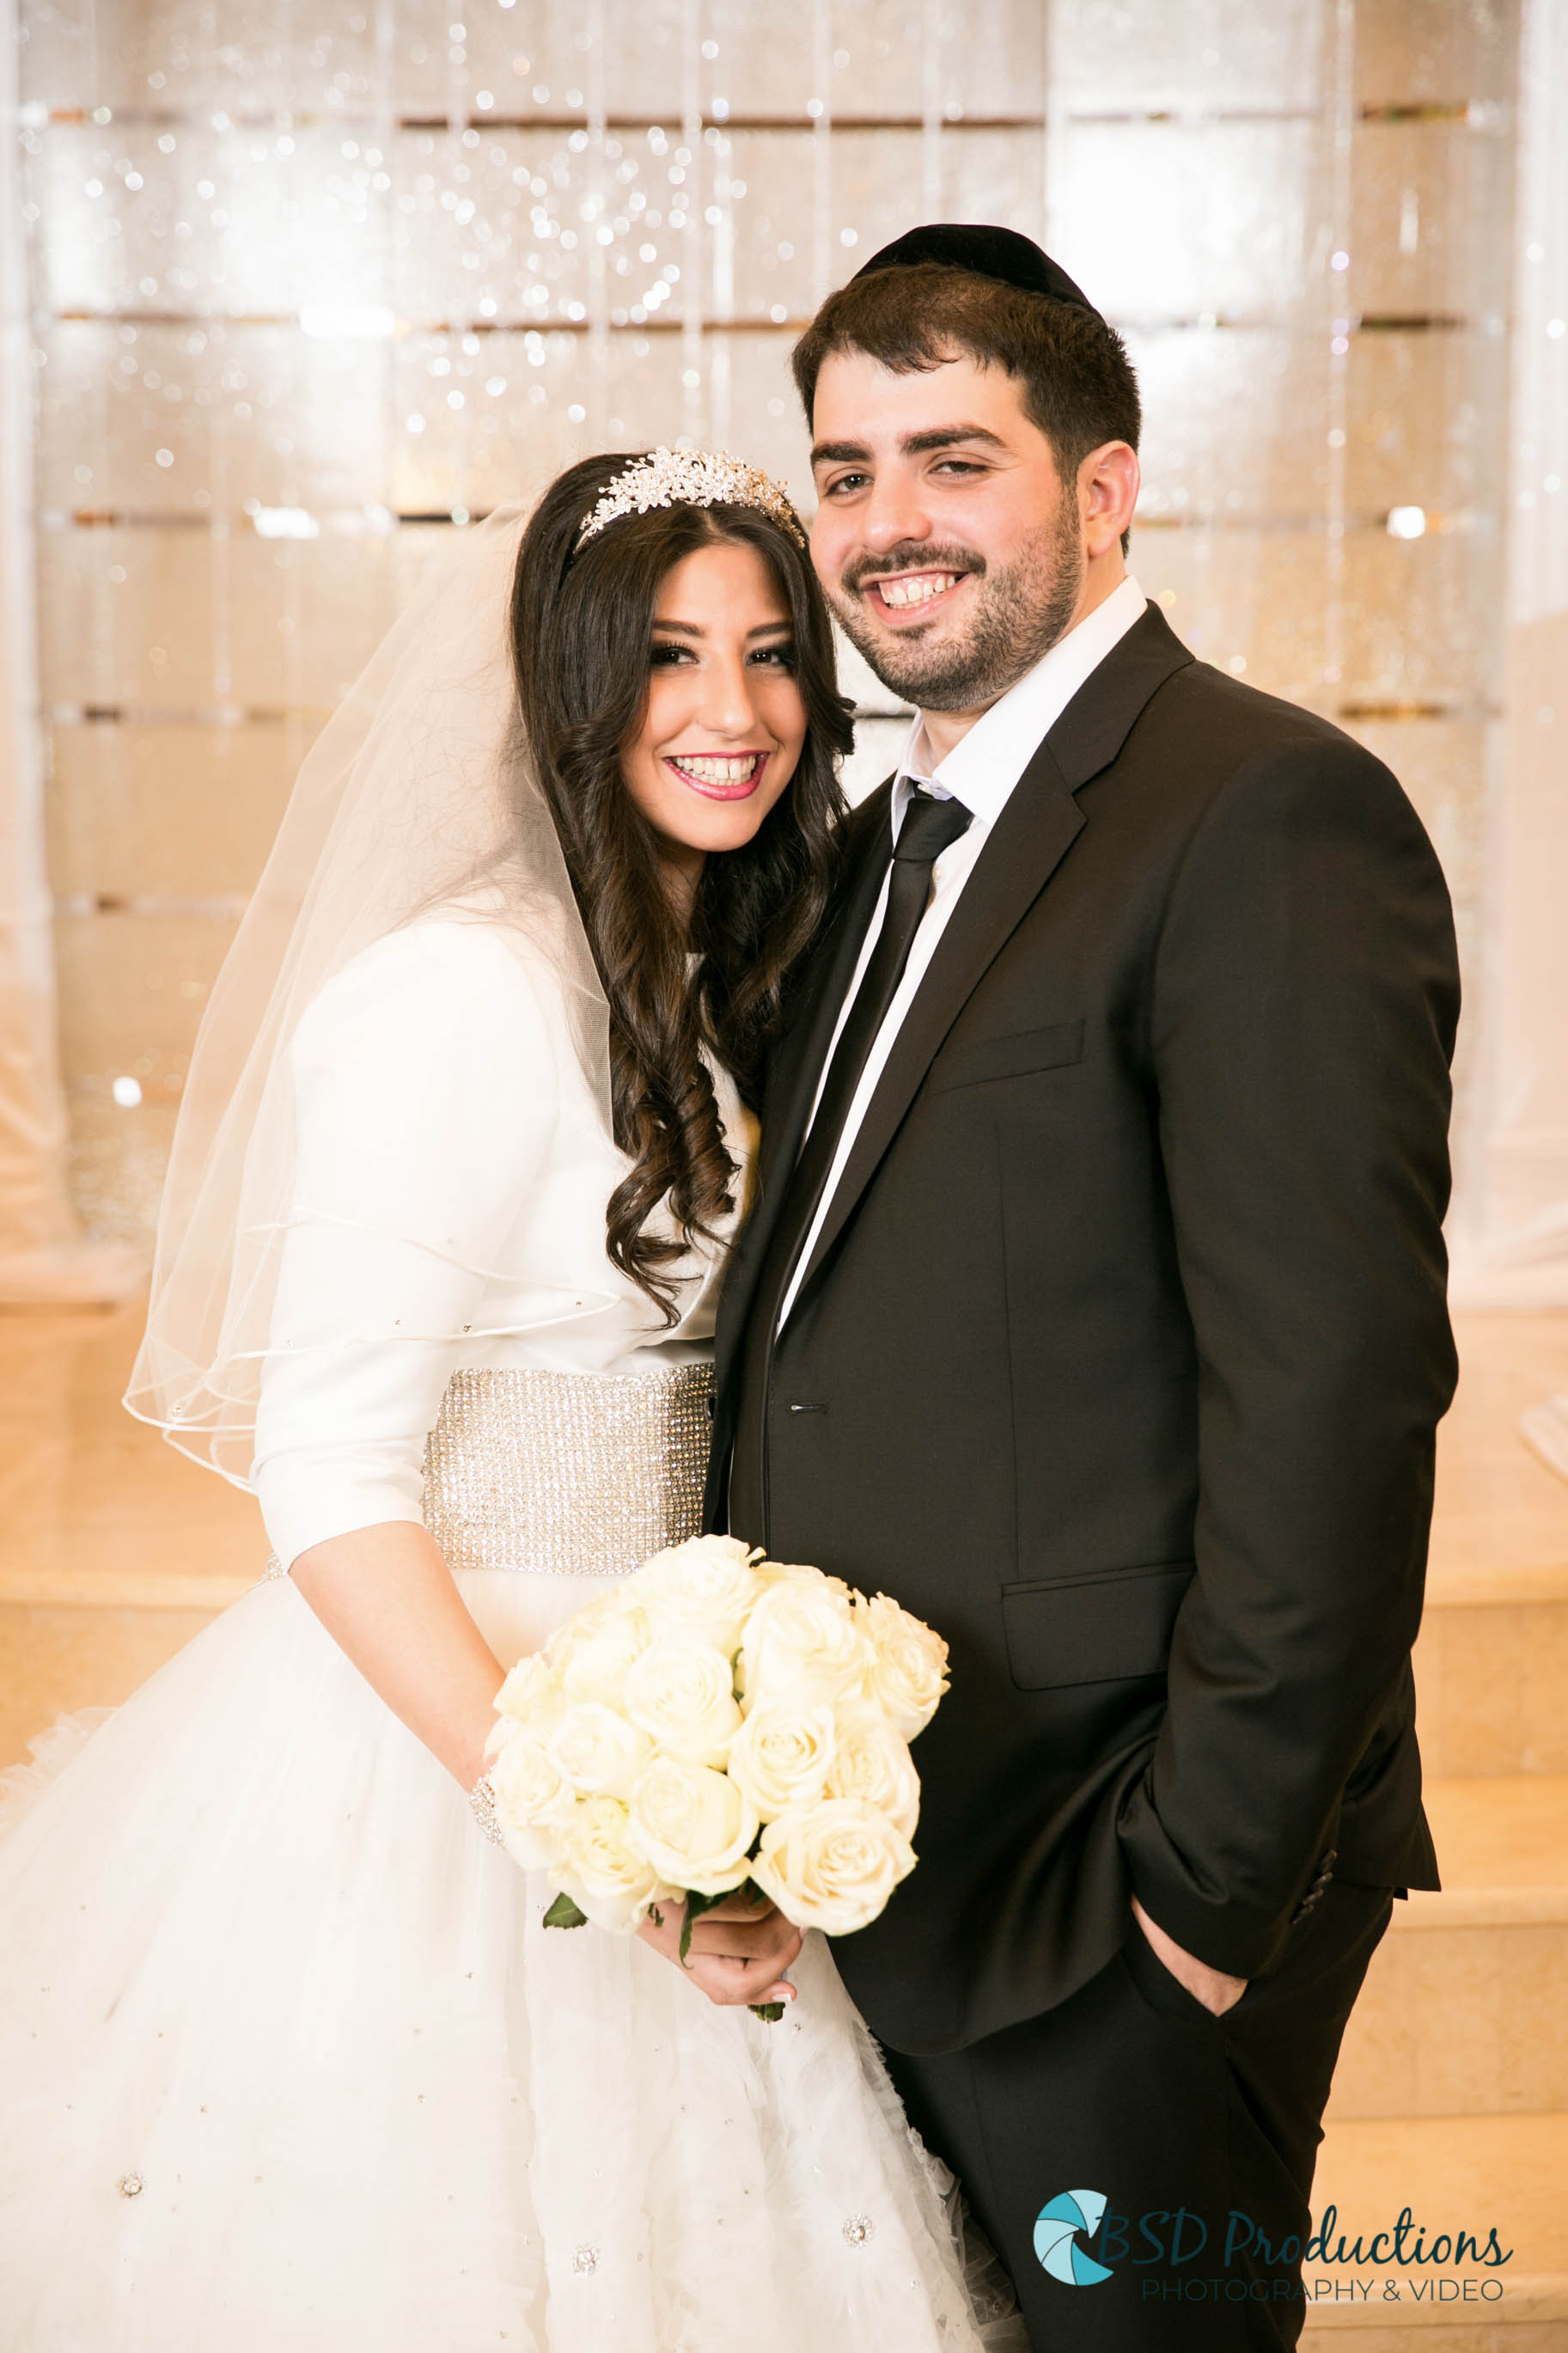 DAV_4827 Wedding – BSD Productions Photography